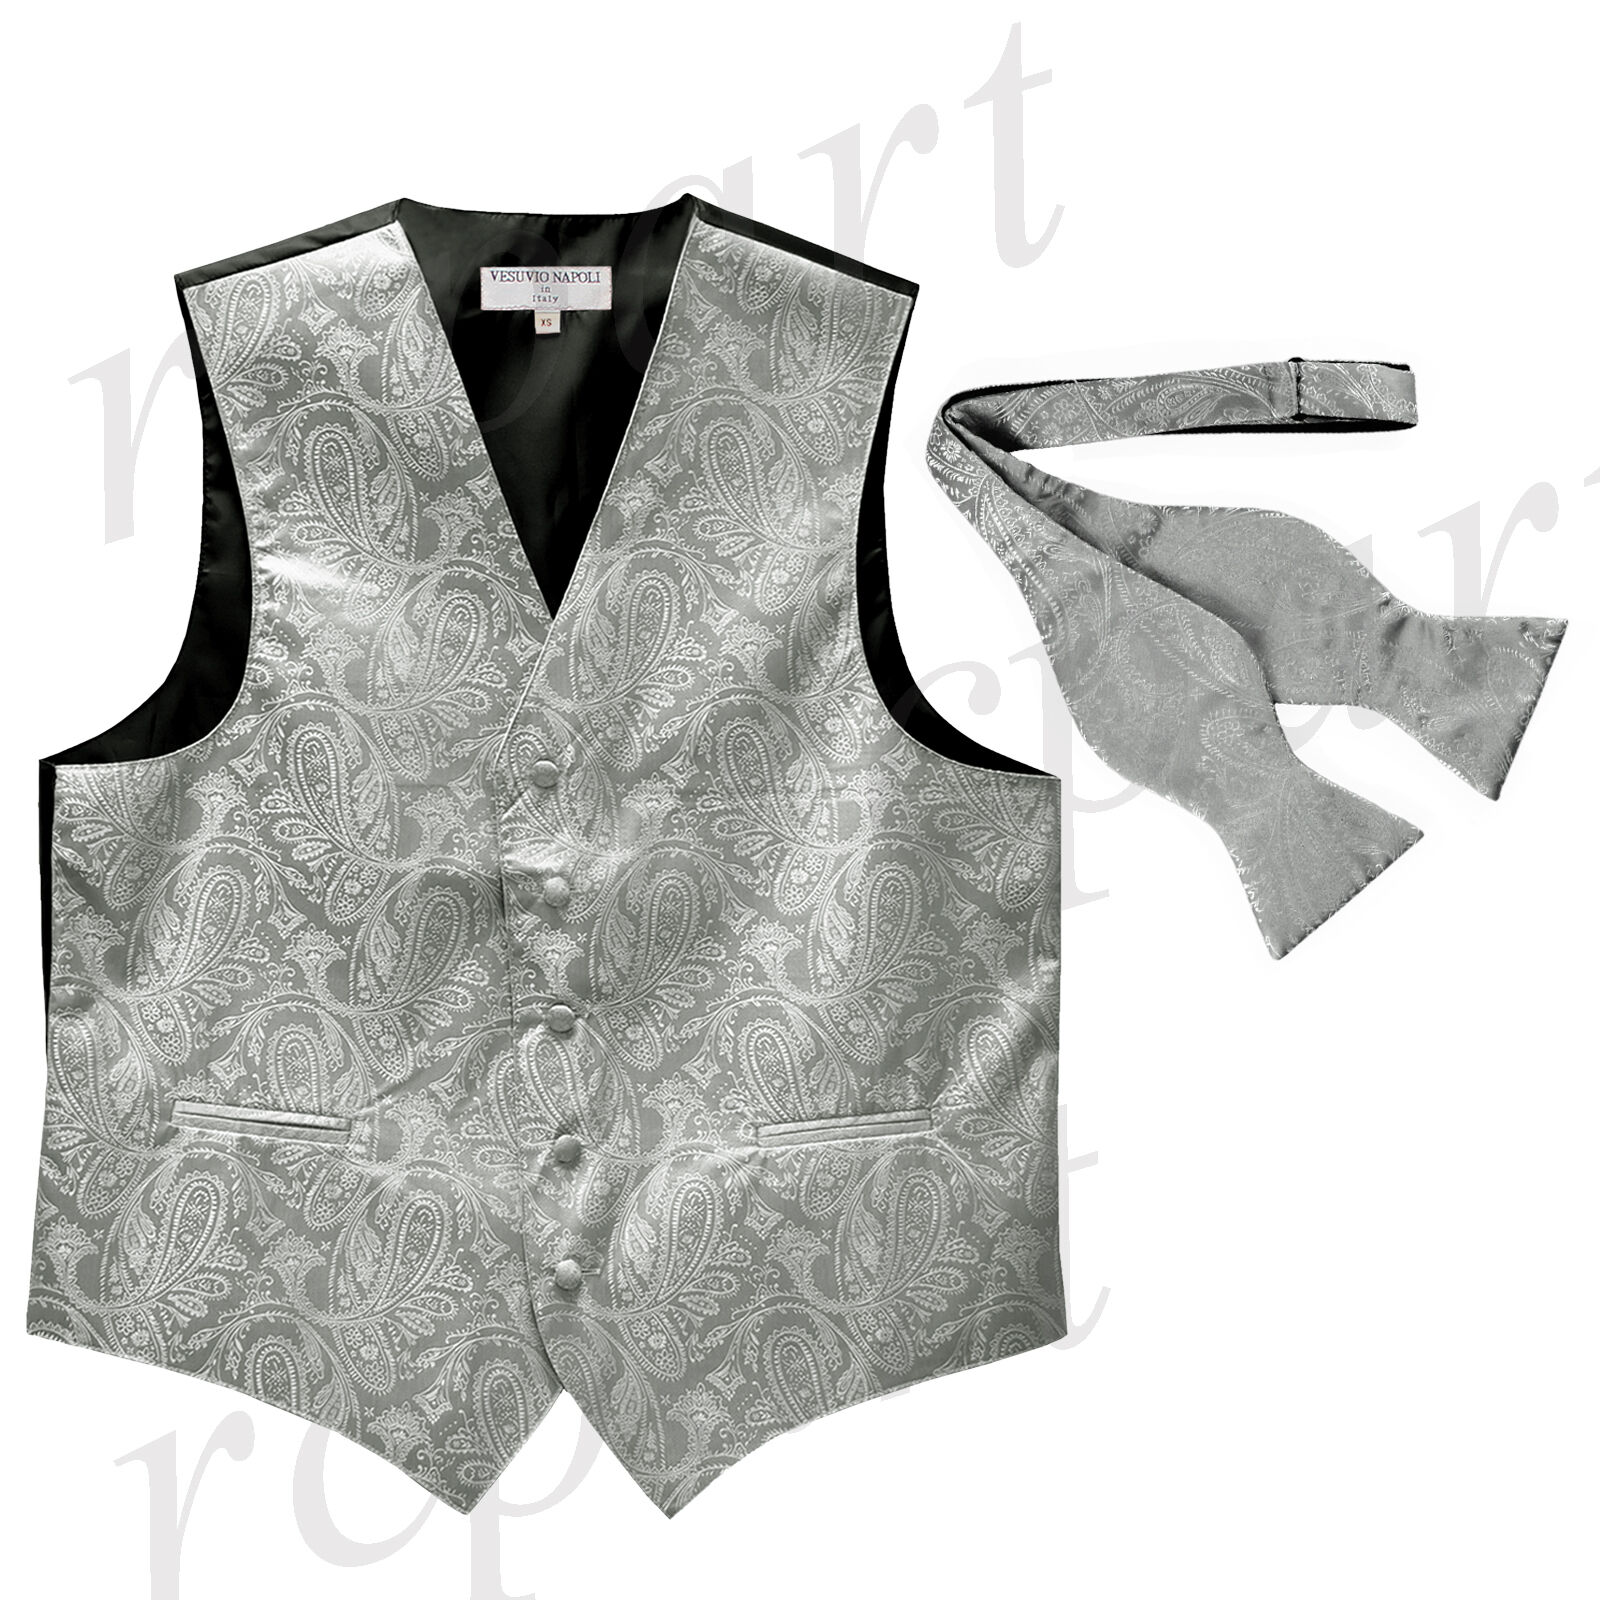 New Men's Vest Tuxedo Waistcoat free style self-tie Bowtie paisley silver party